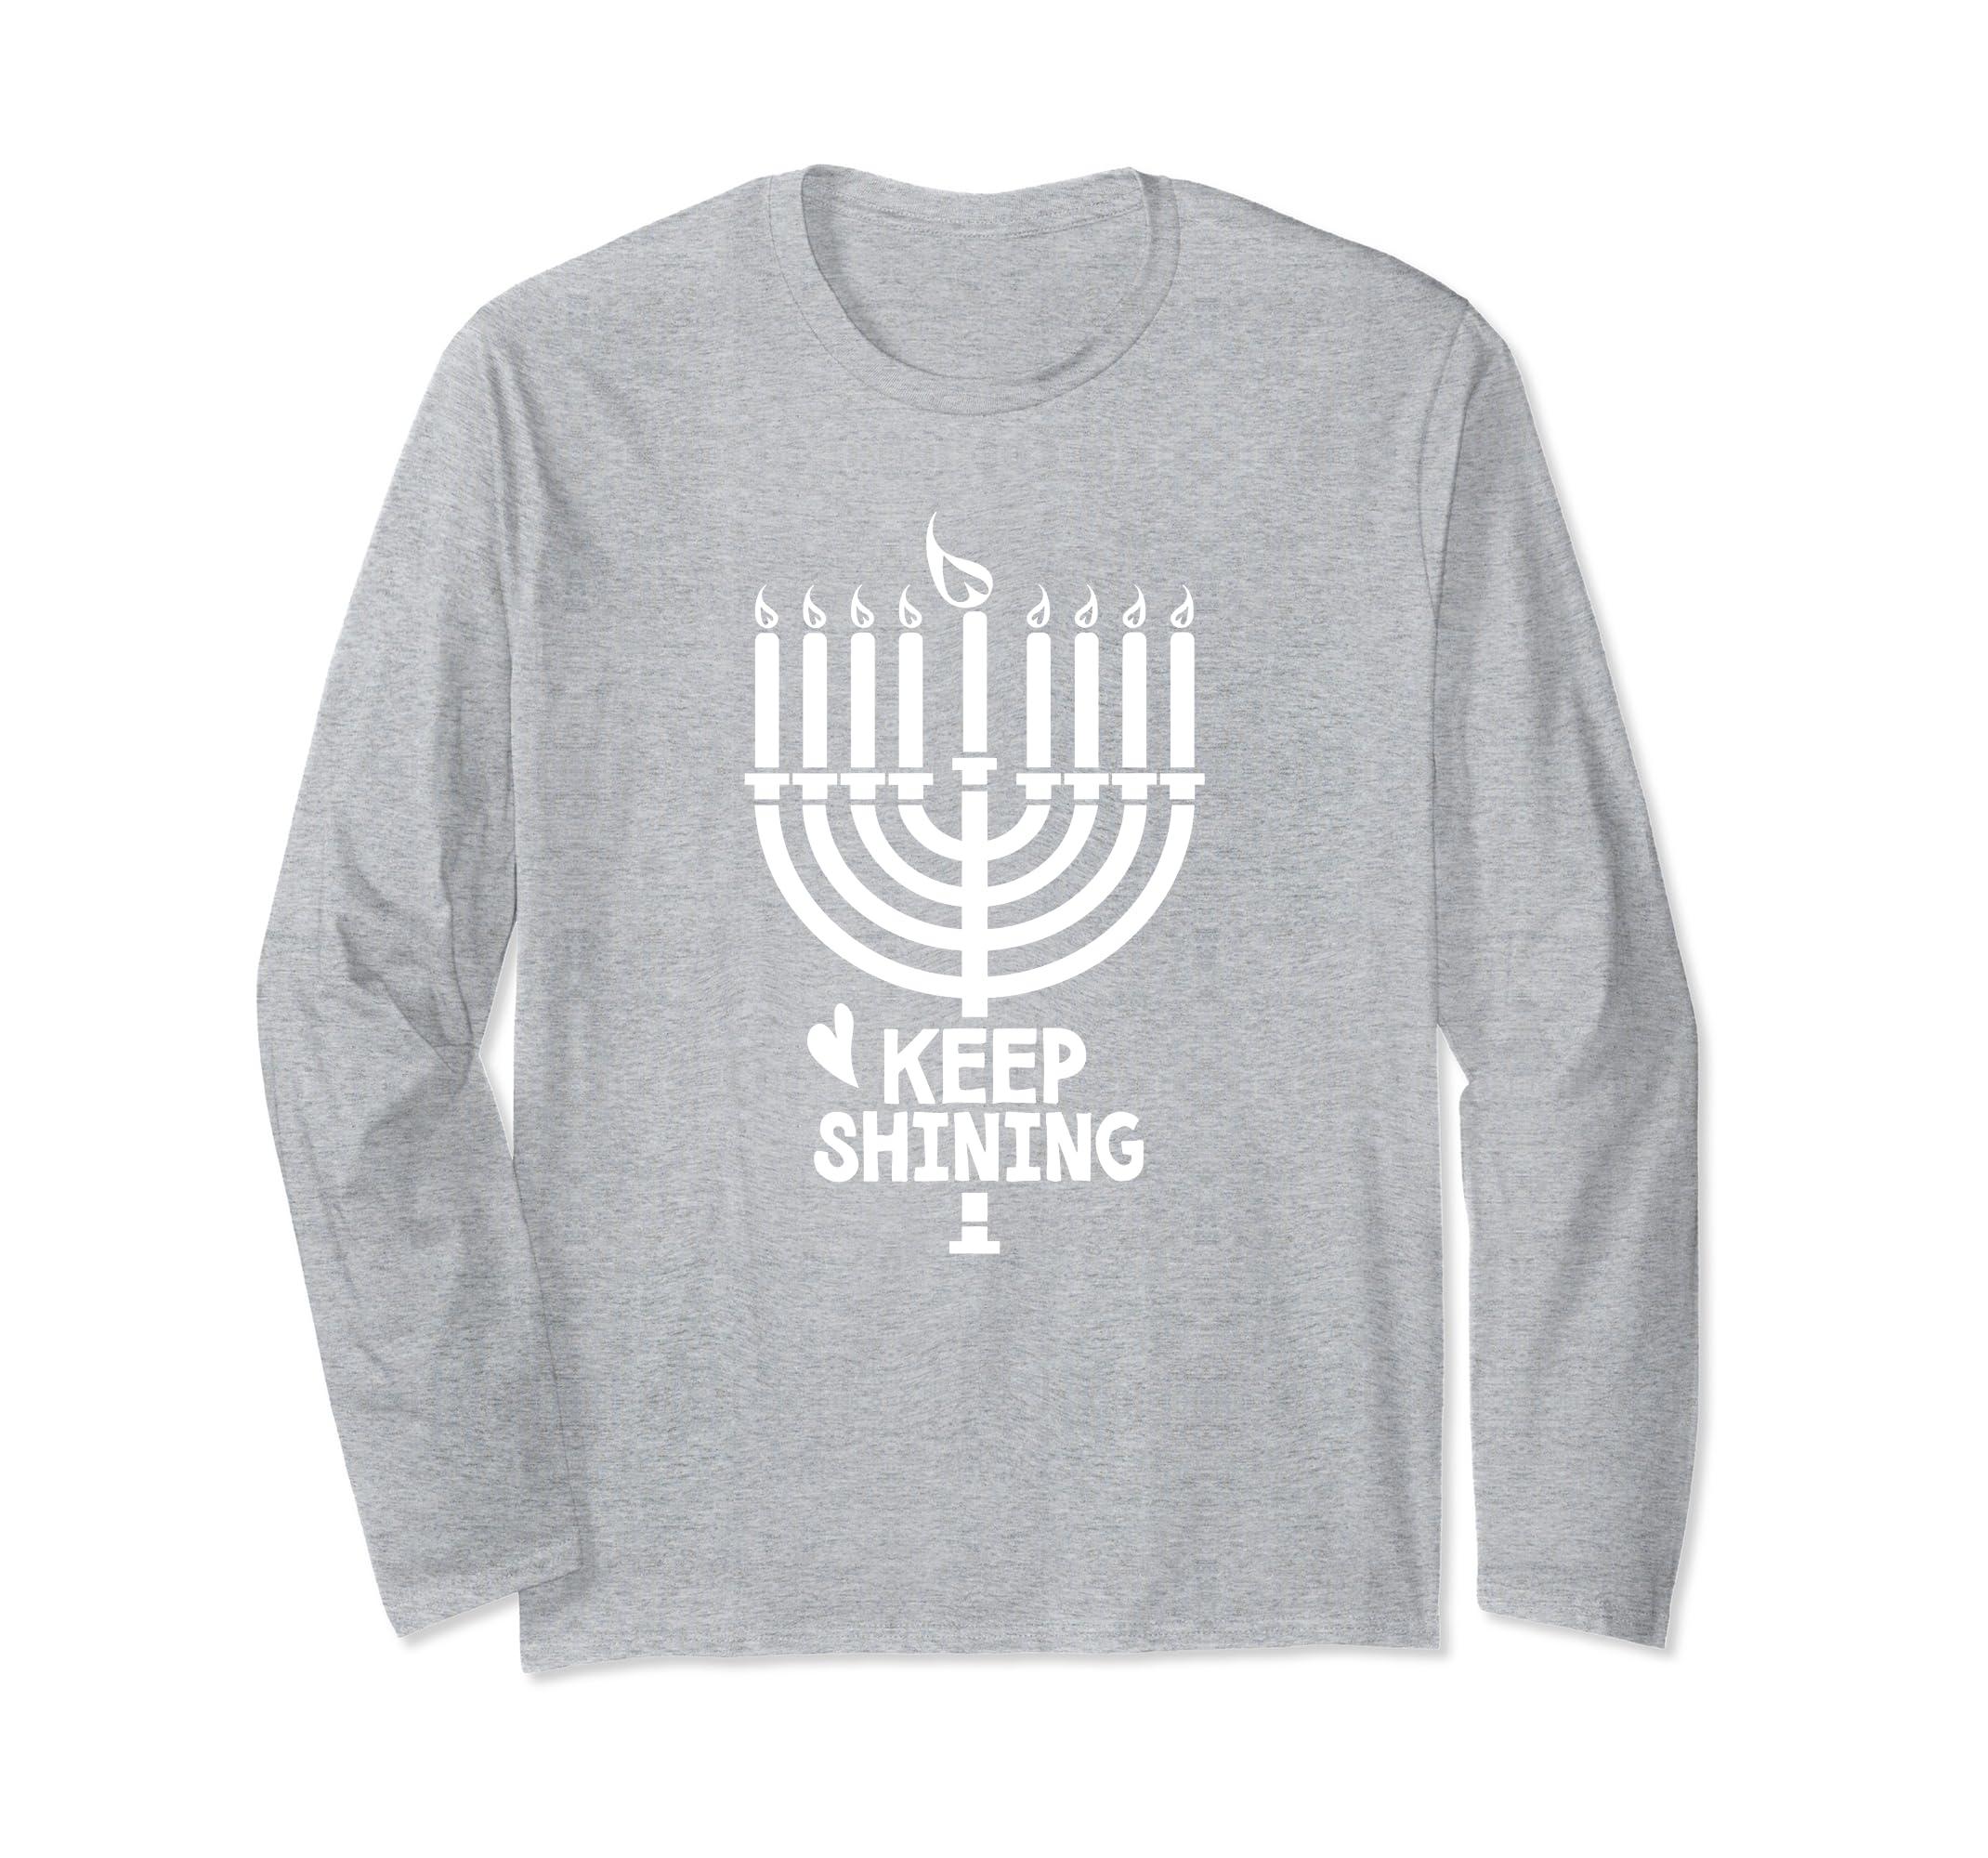 Free To Be Kids Hanukkah Shirt, Menorah Candles Holiday-SFL